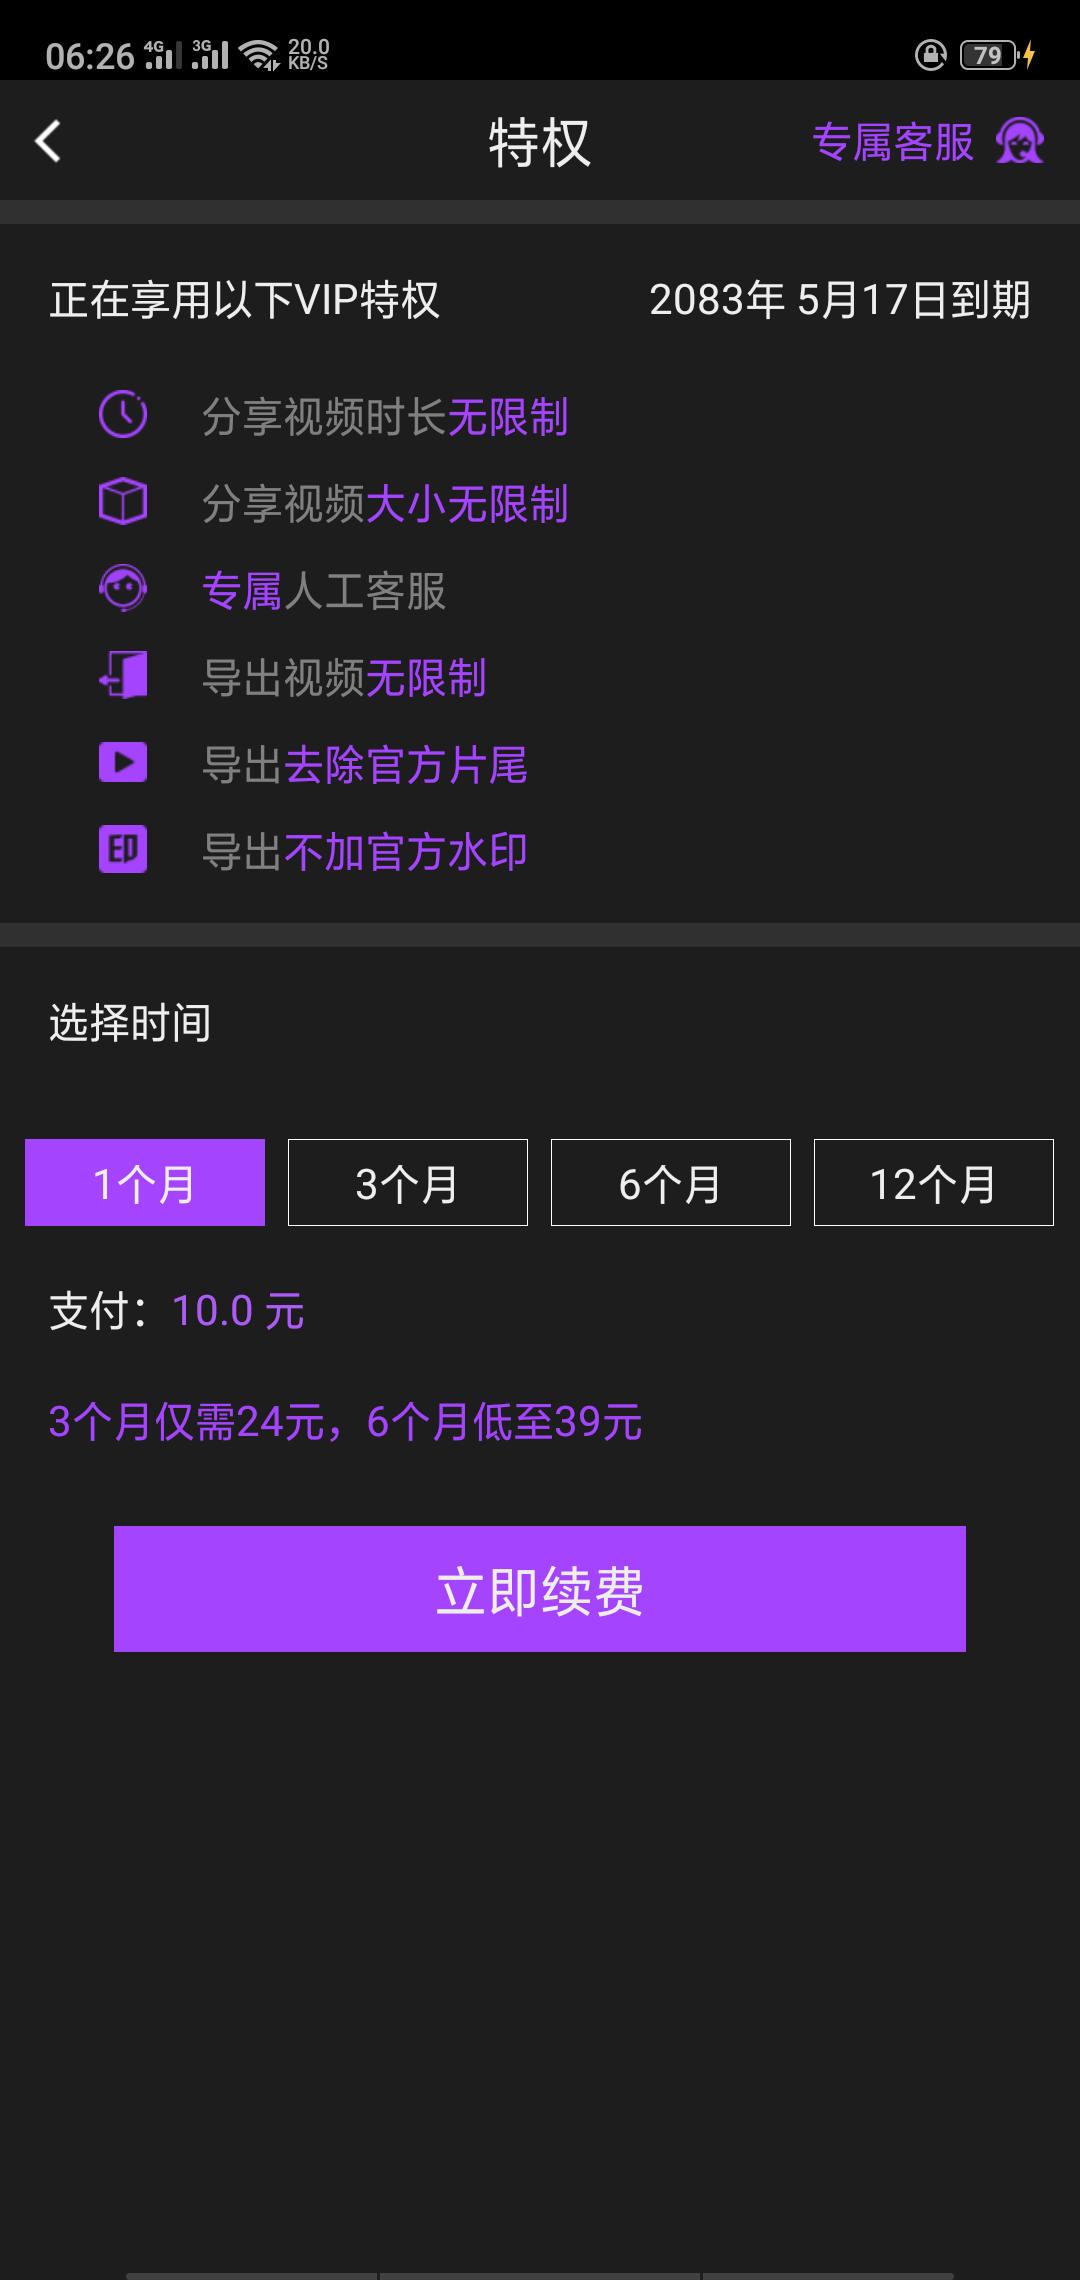 【LUR】HttpCanary抓包修改金额-www.im86.com